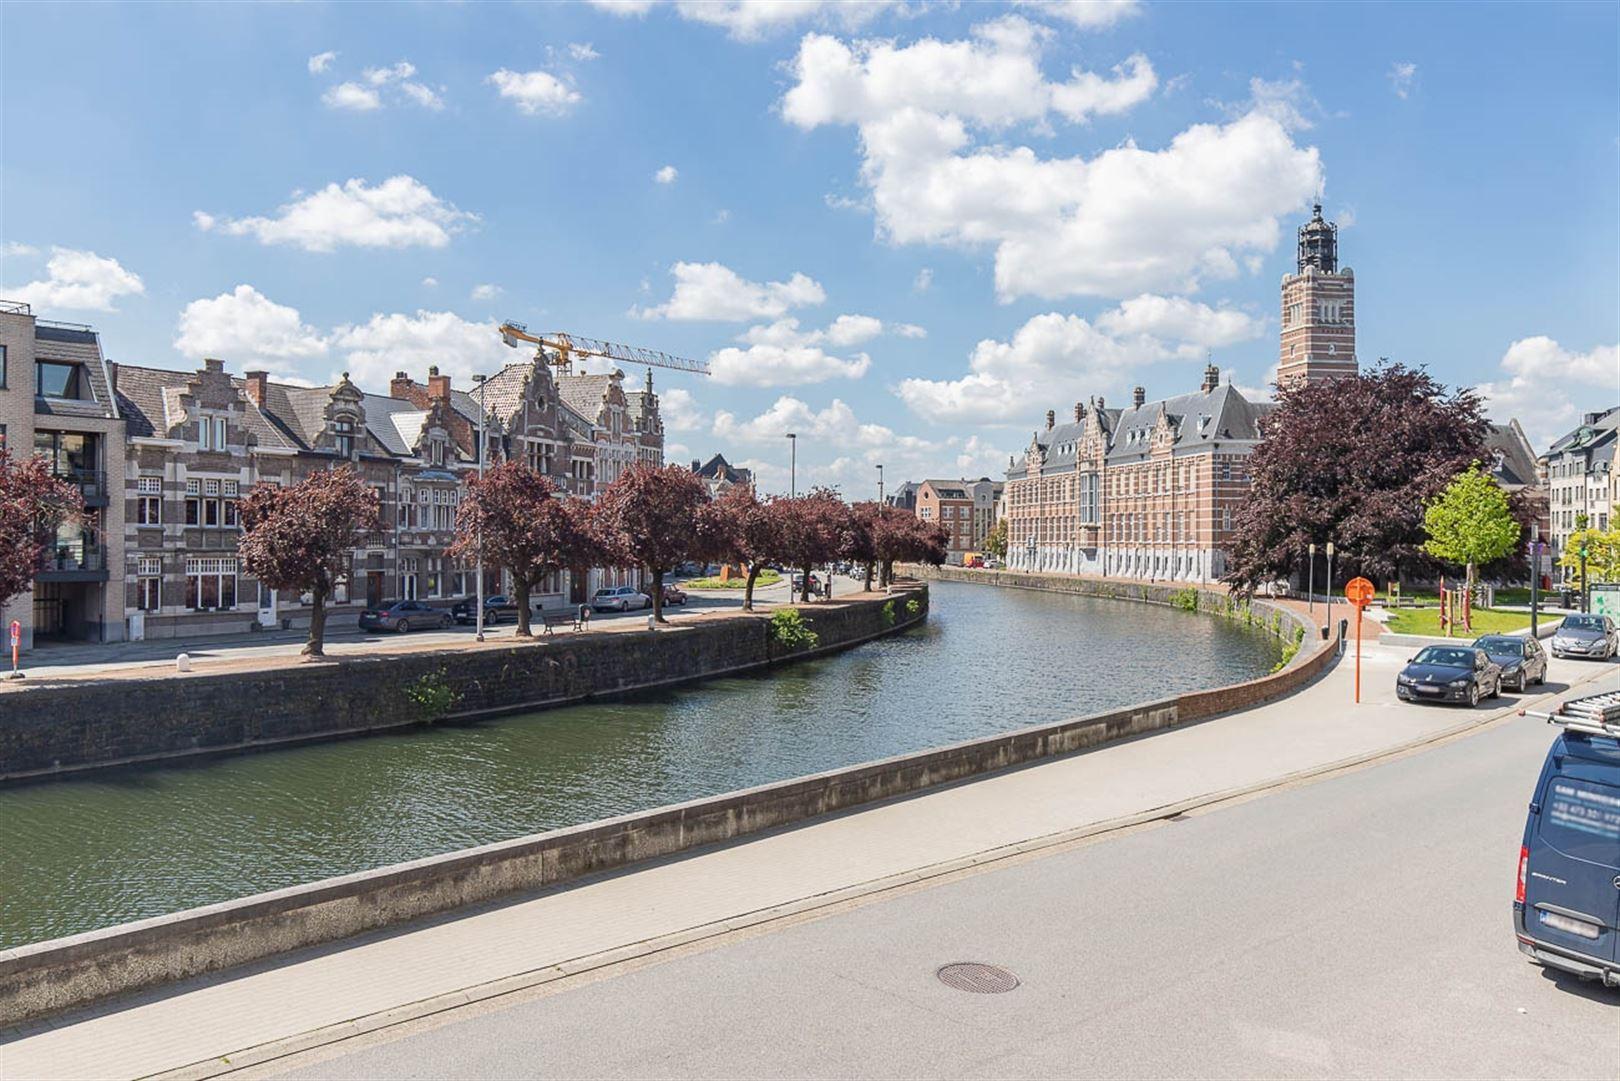 Foto 5 : Duplex/triplex te 9200 DENDERMONDE (België) - Prijs € 495.000